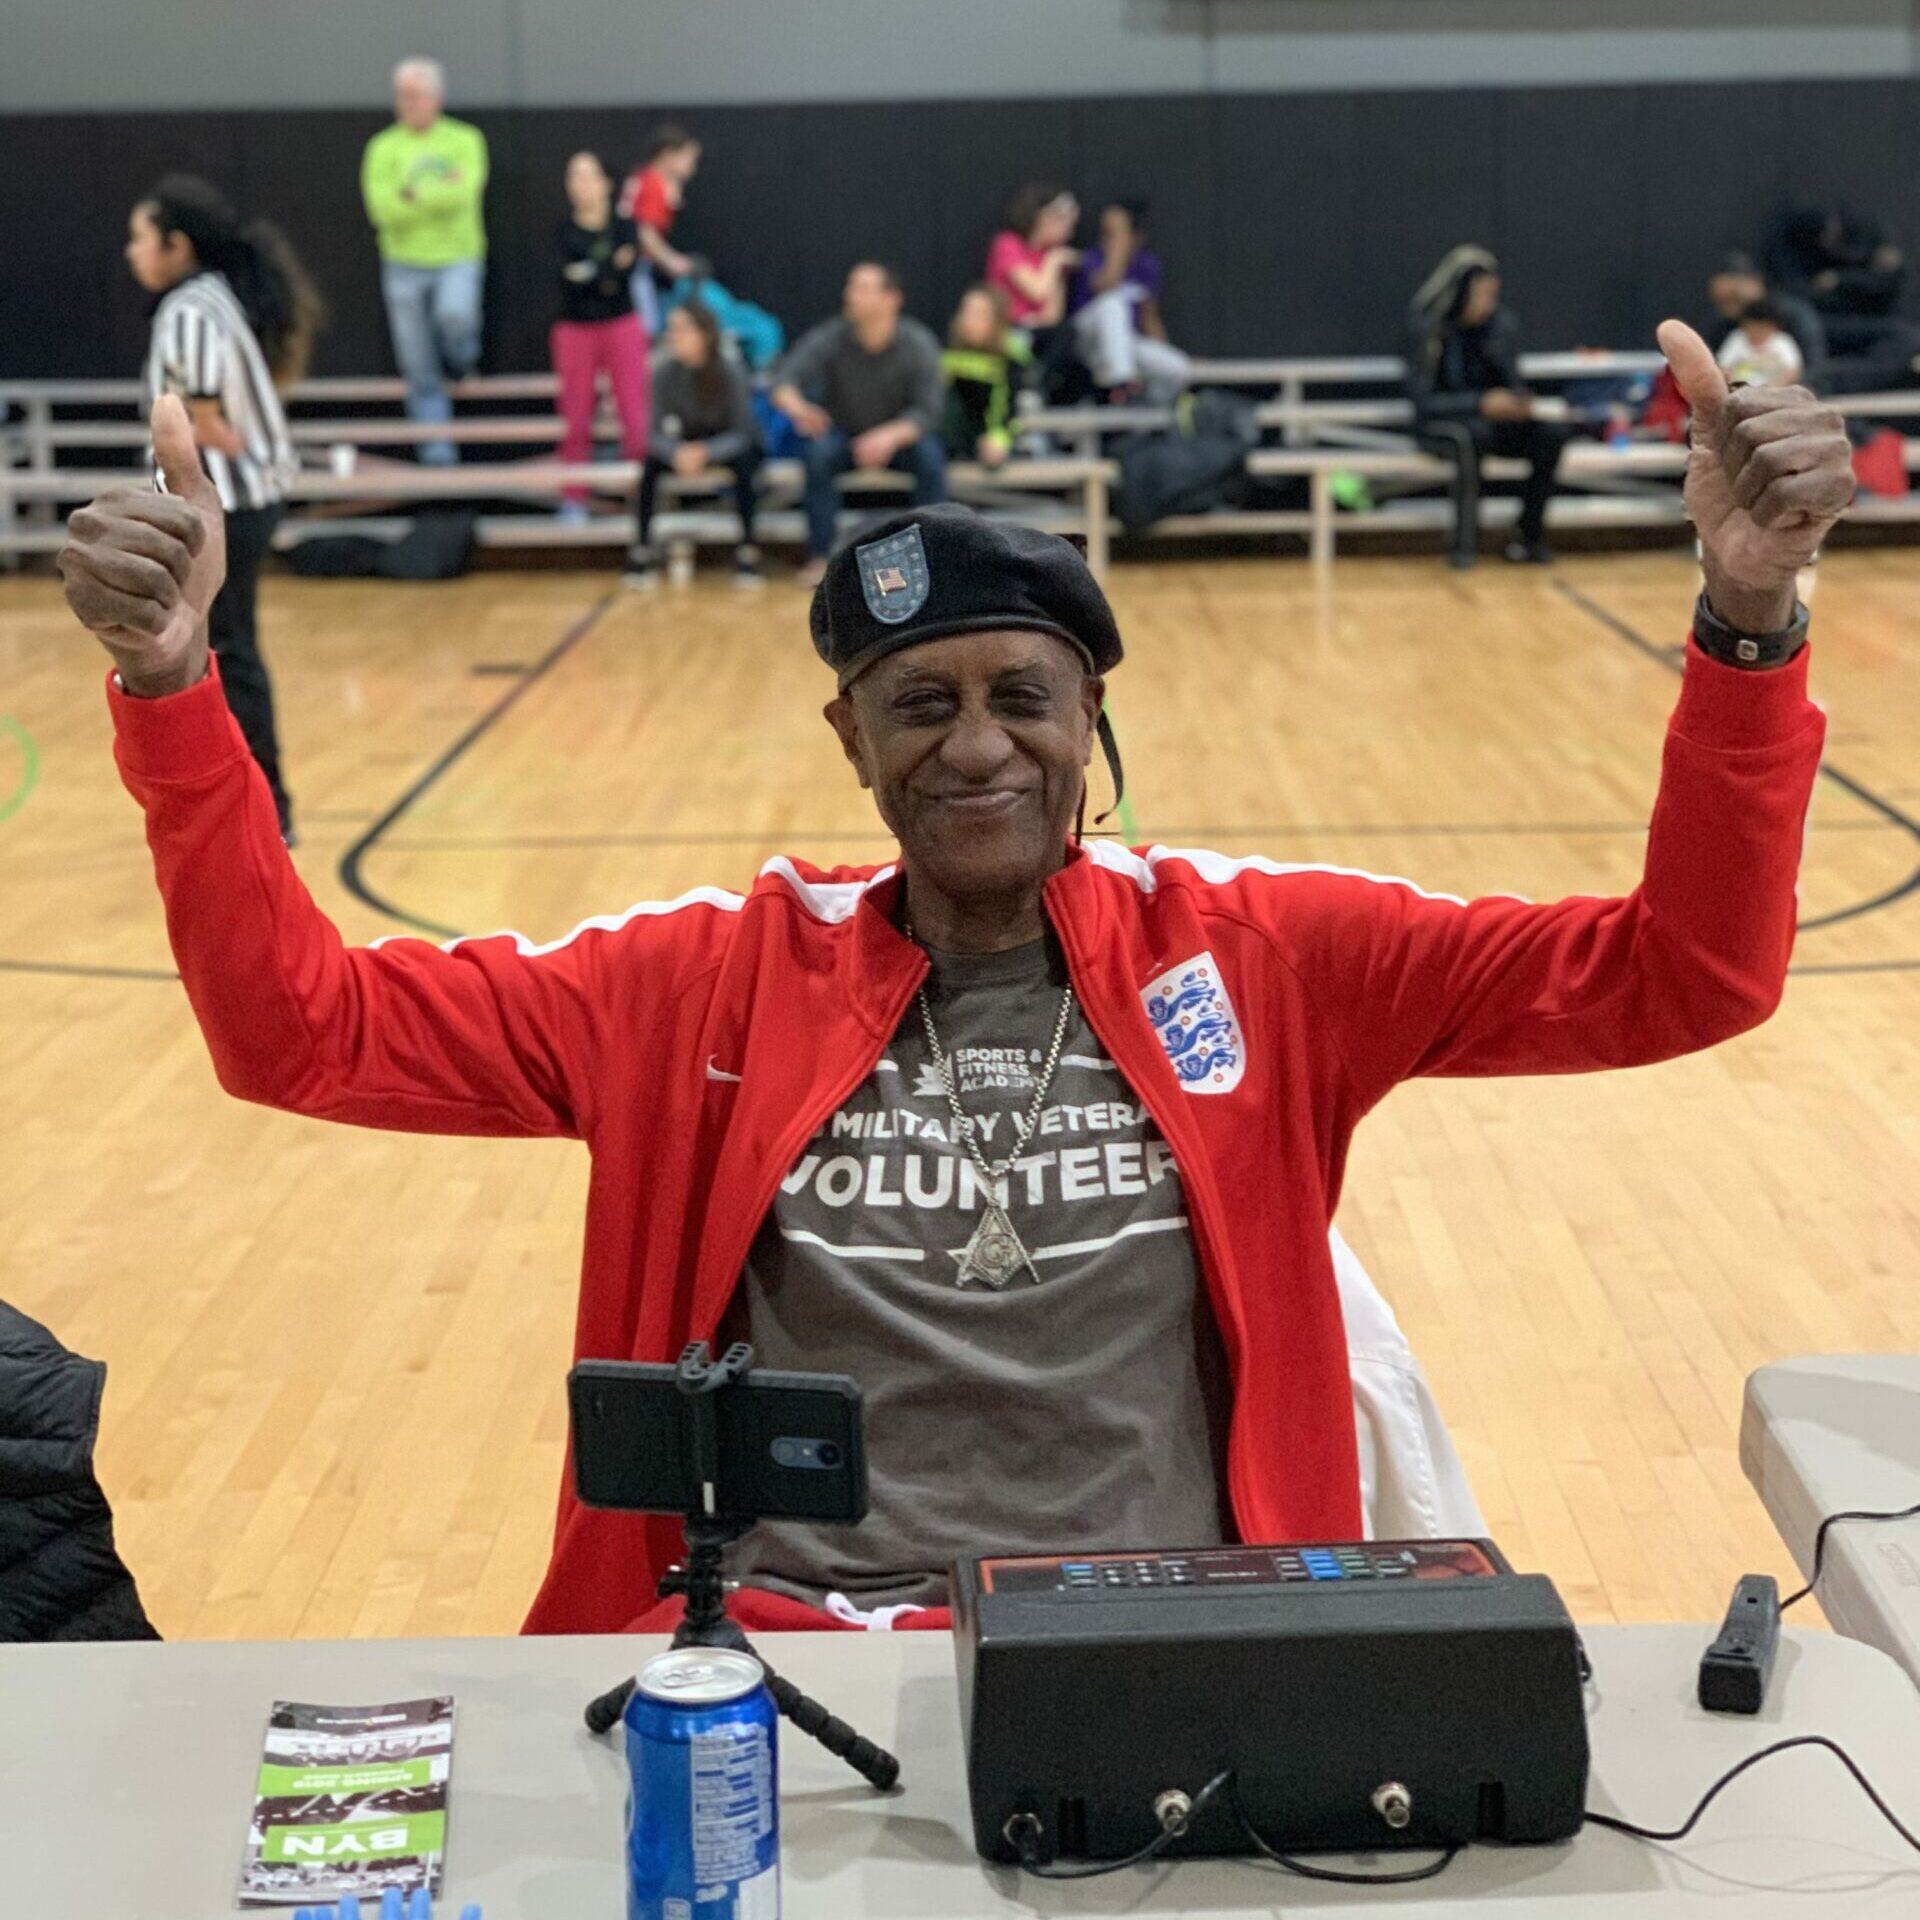 Veterans Volunteer Initiative Breakthrough